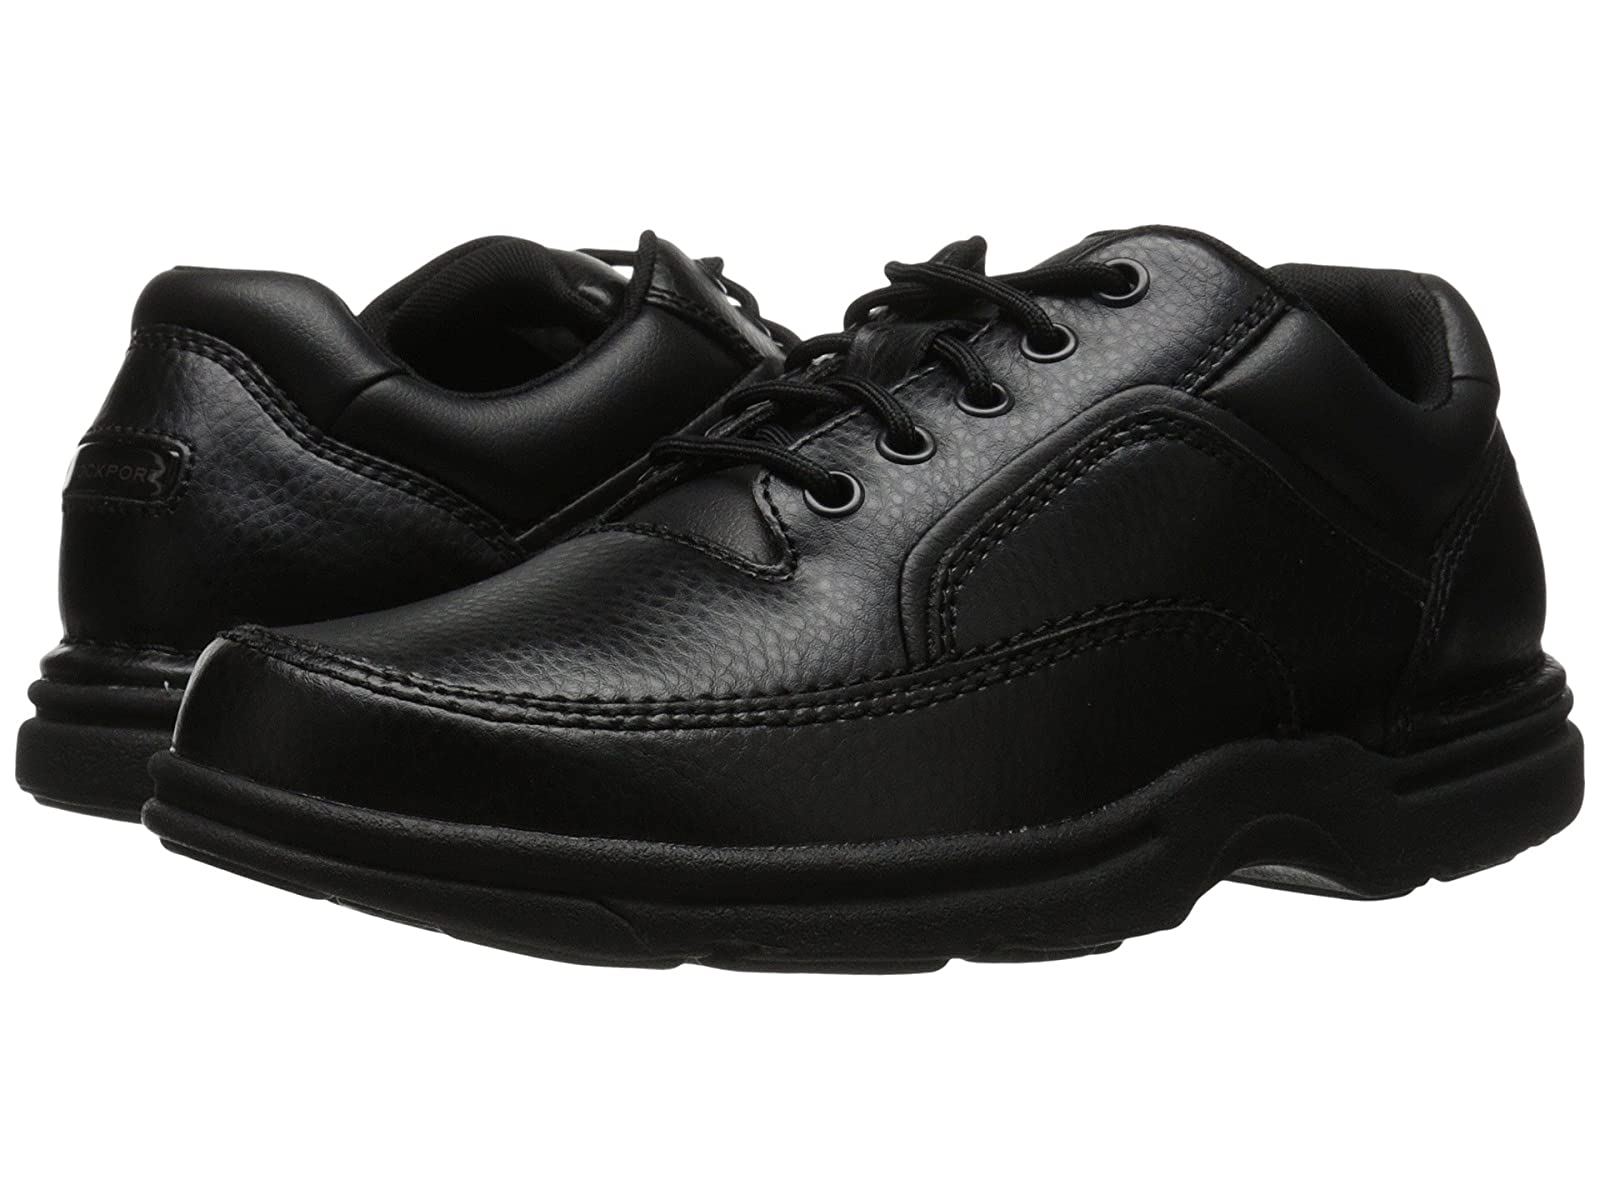 Rockport EurekaCheap and distinctive eye-catching shoes